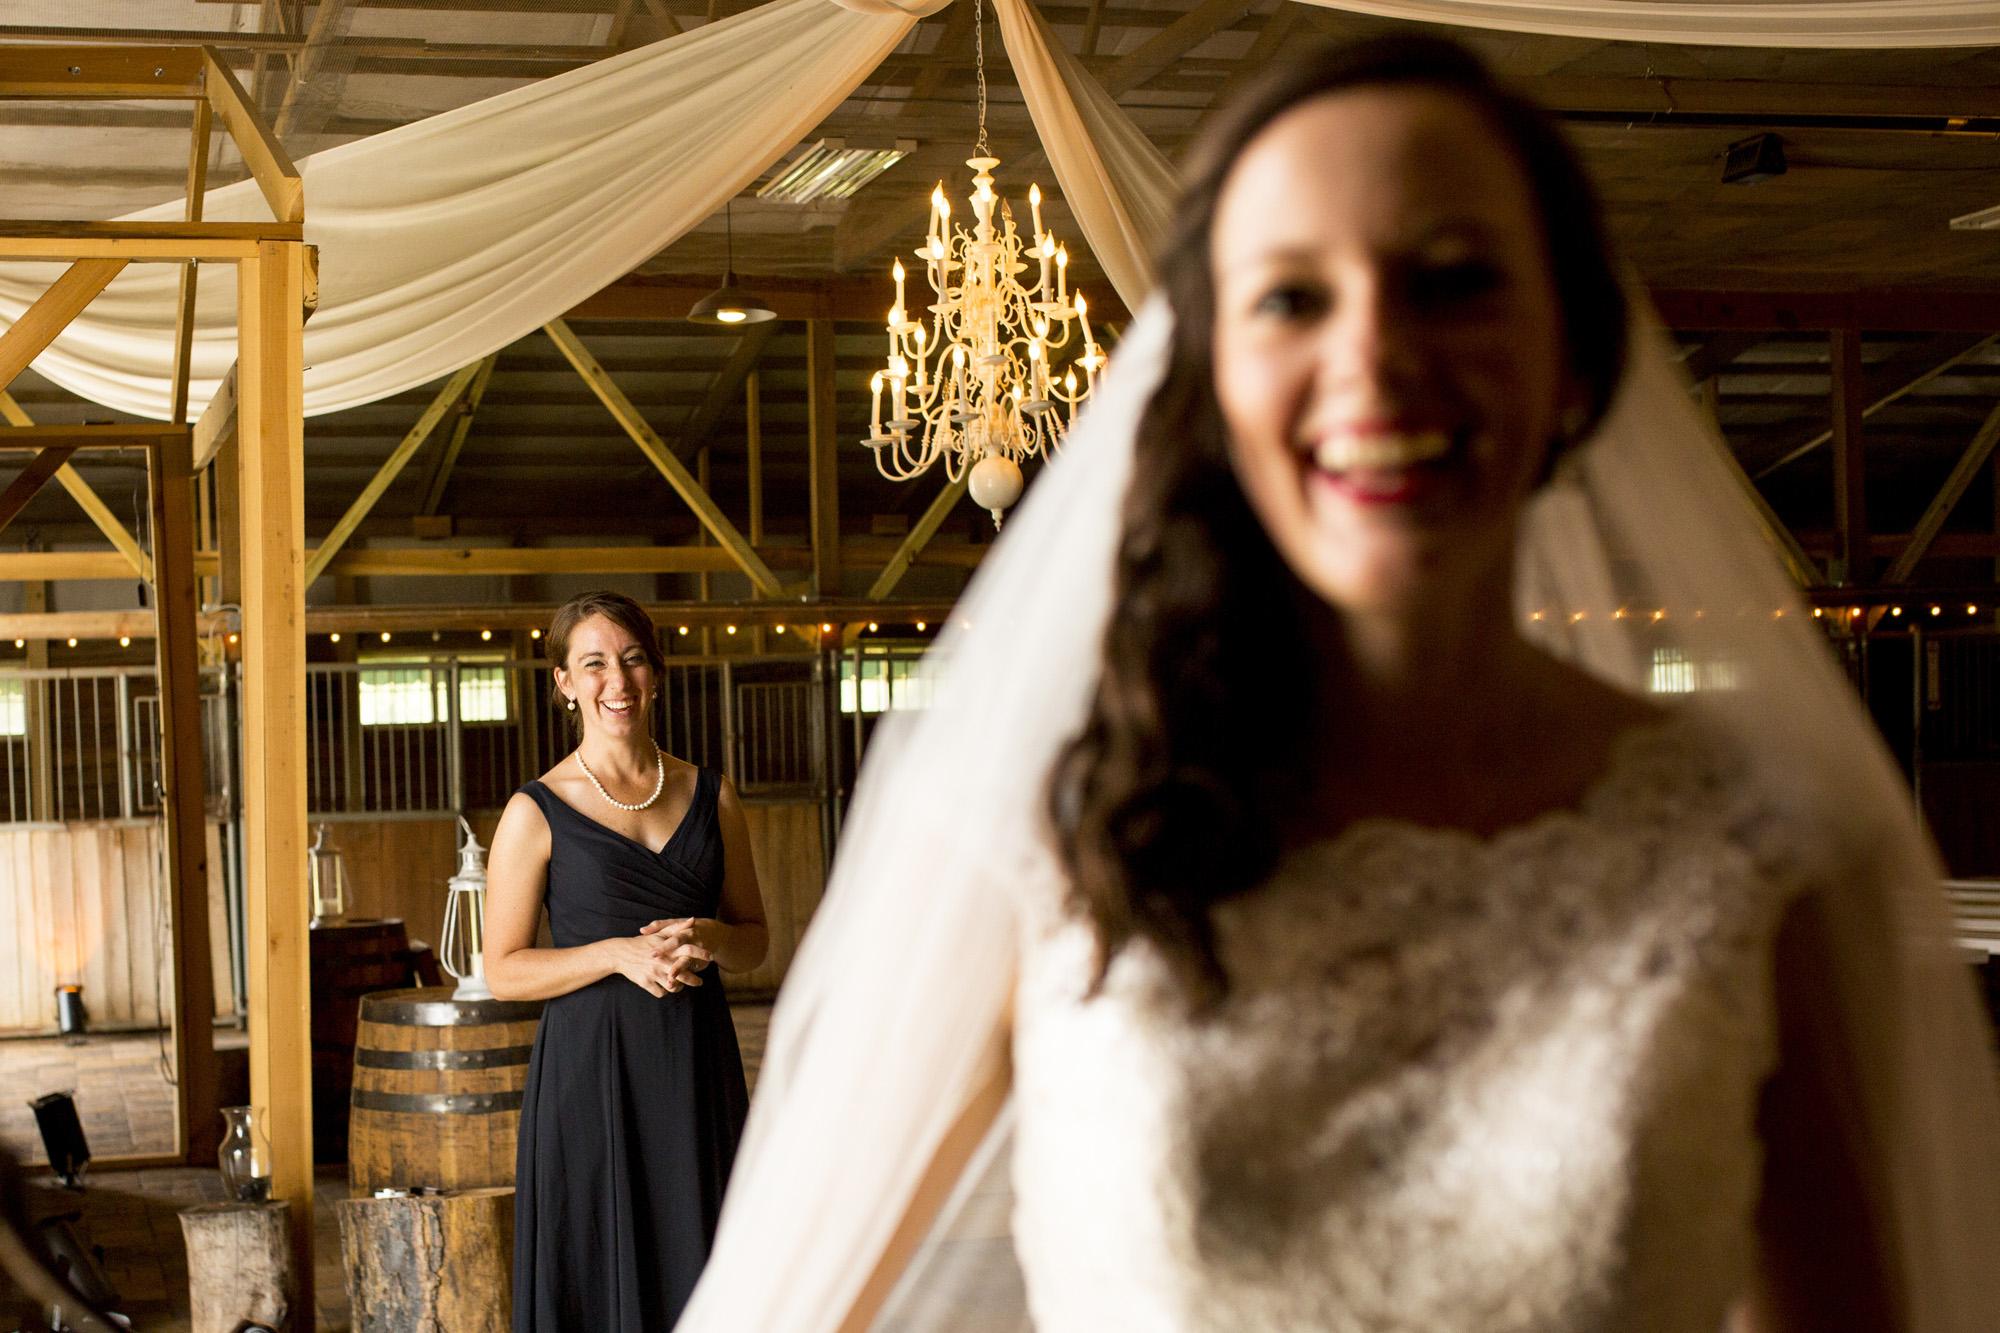 Seriously_Sabrina_Photography_Bowling_Green_Kentucky_Highland_Stables_Wedding_Wolff23.jpg